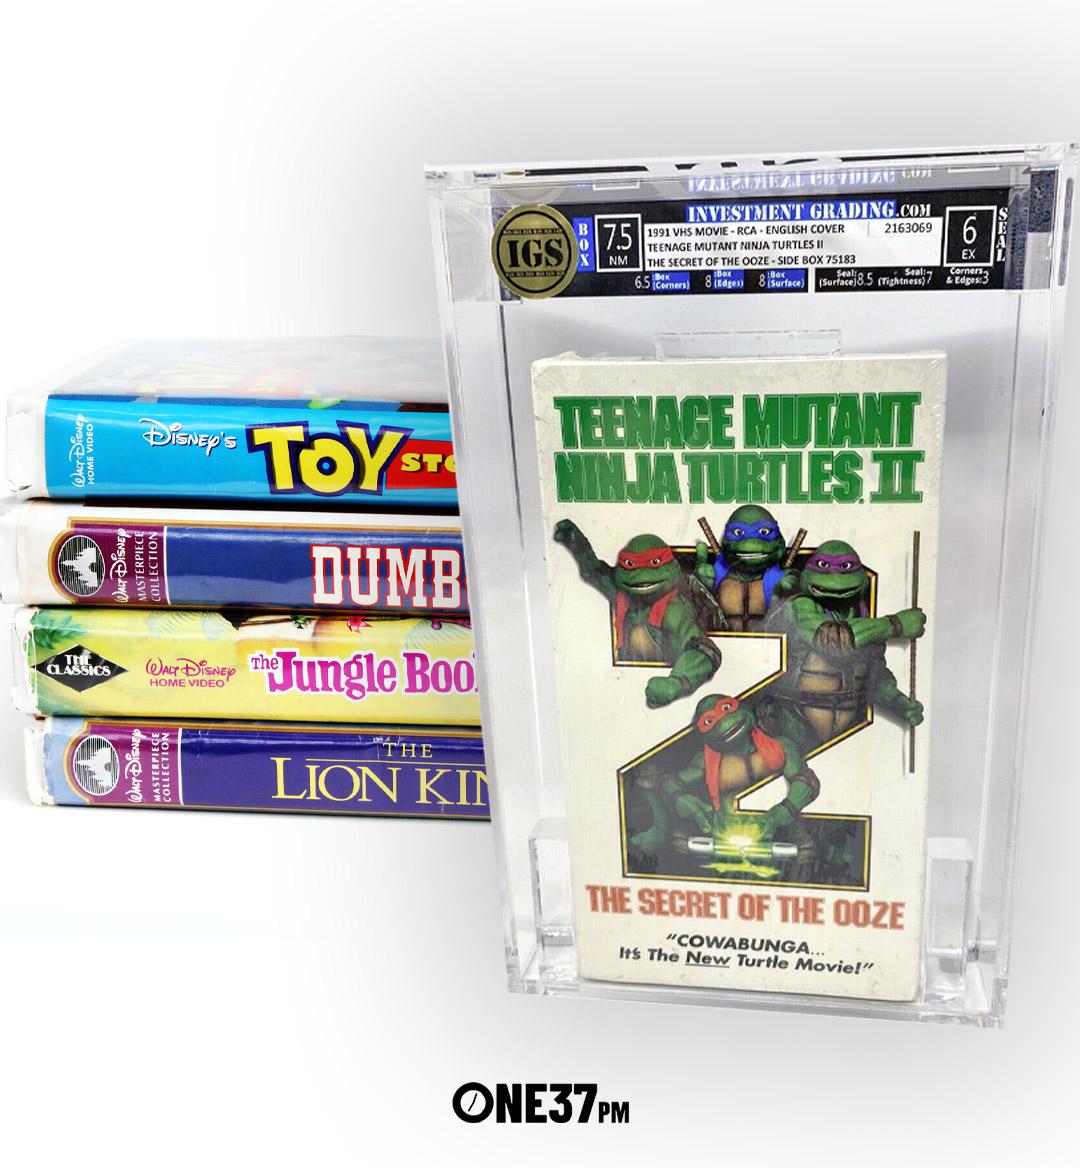 mobile VHS copy